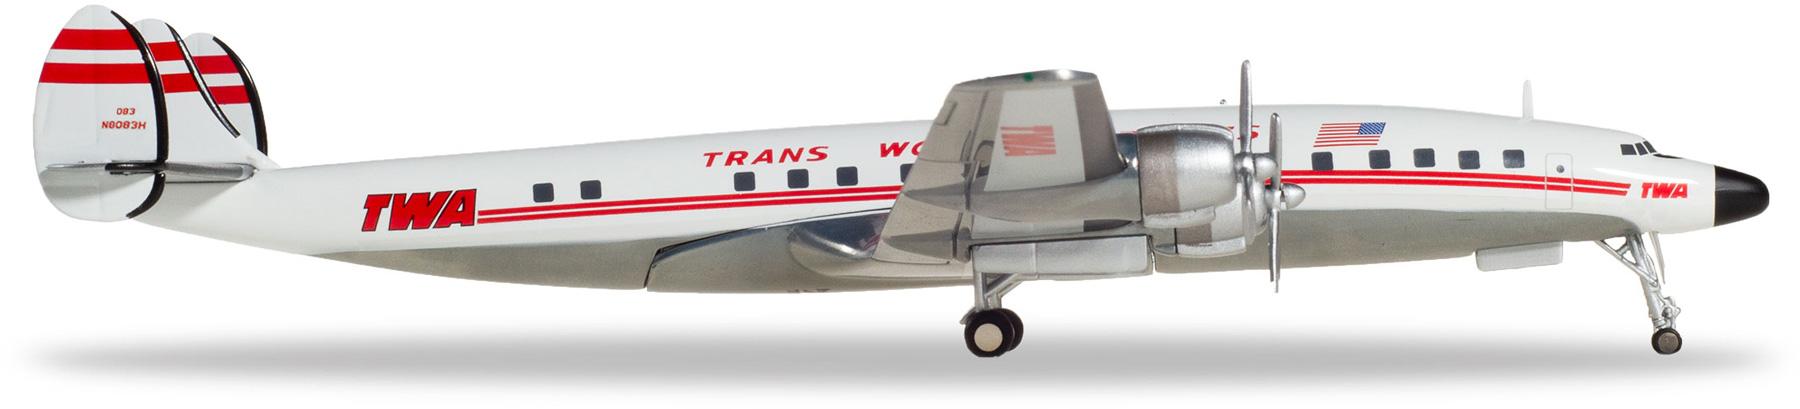 1:200 558372-001 TWA-Trans World Airlines LOCKHEED l-1649a Jetstream